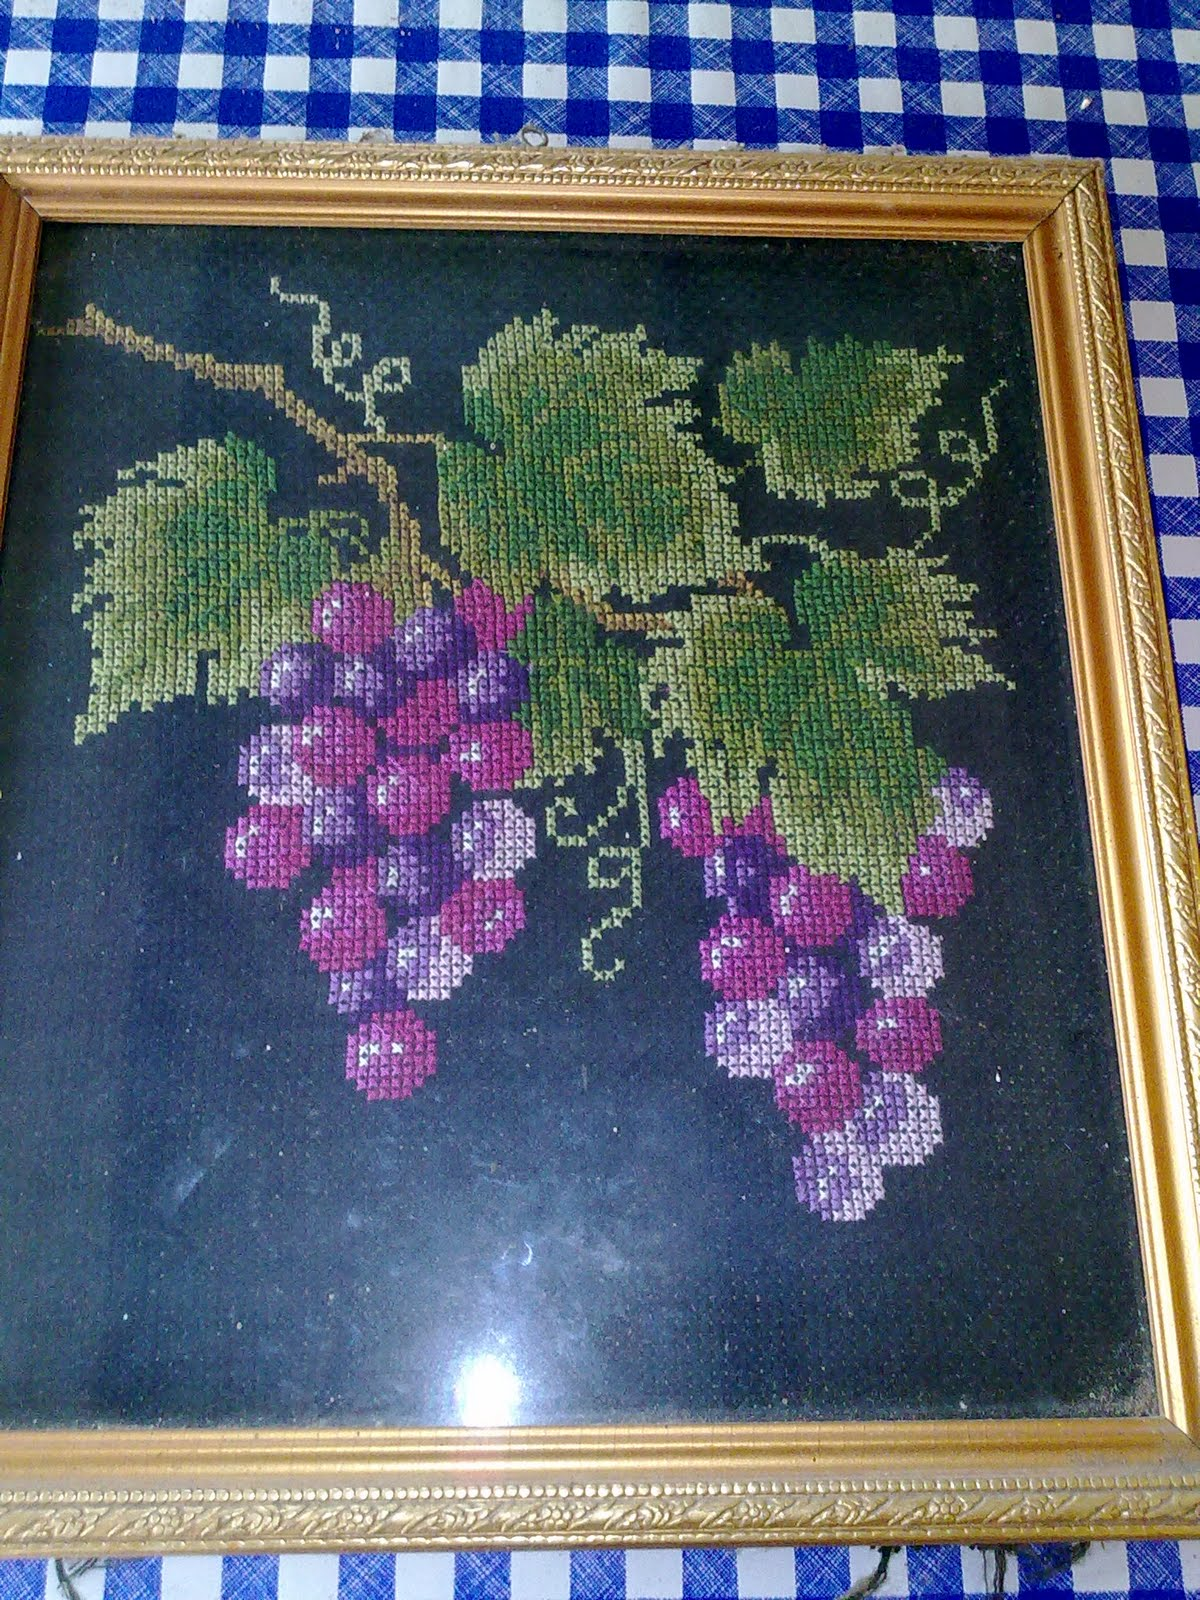 Ctnhoney Koleksi Cross Stitch Yang Antik